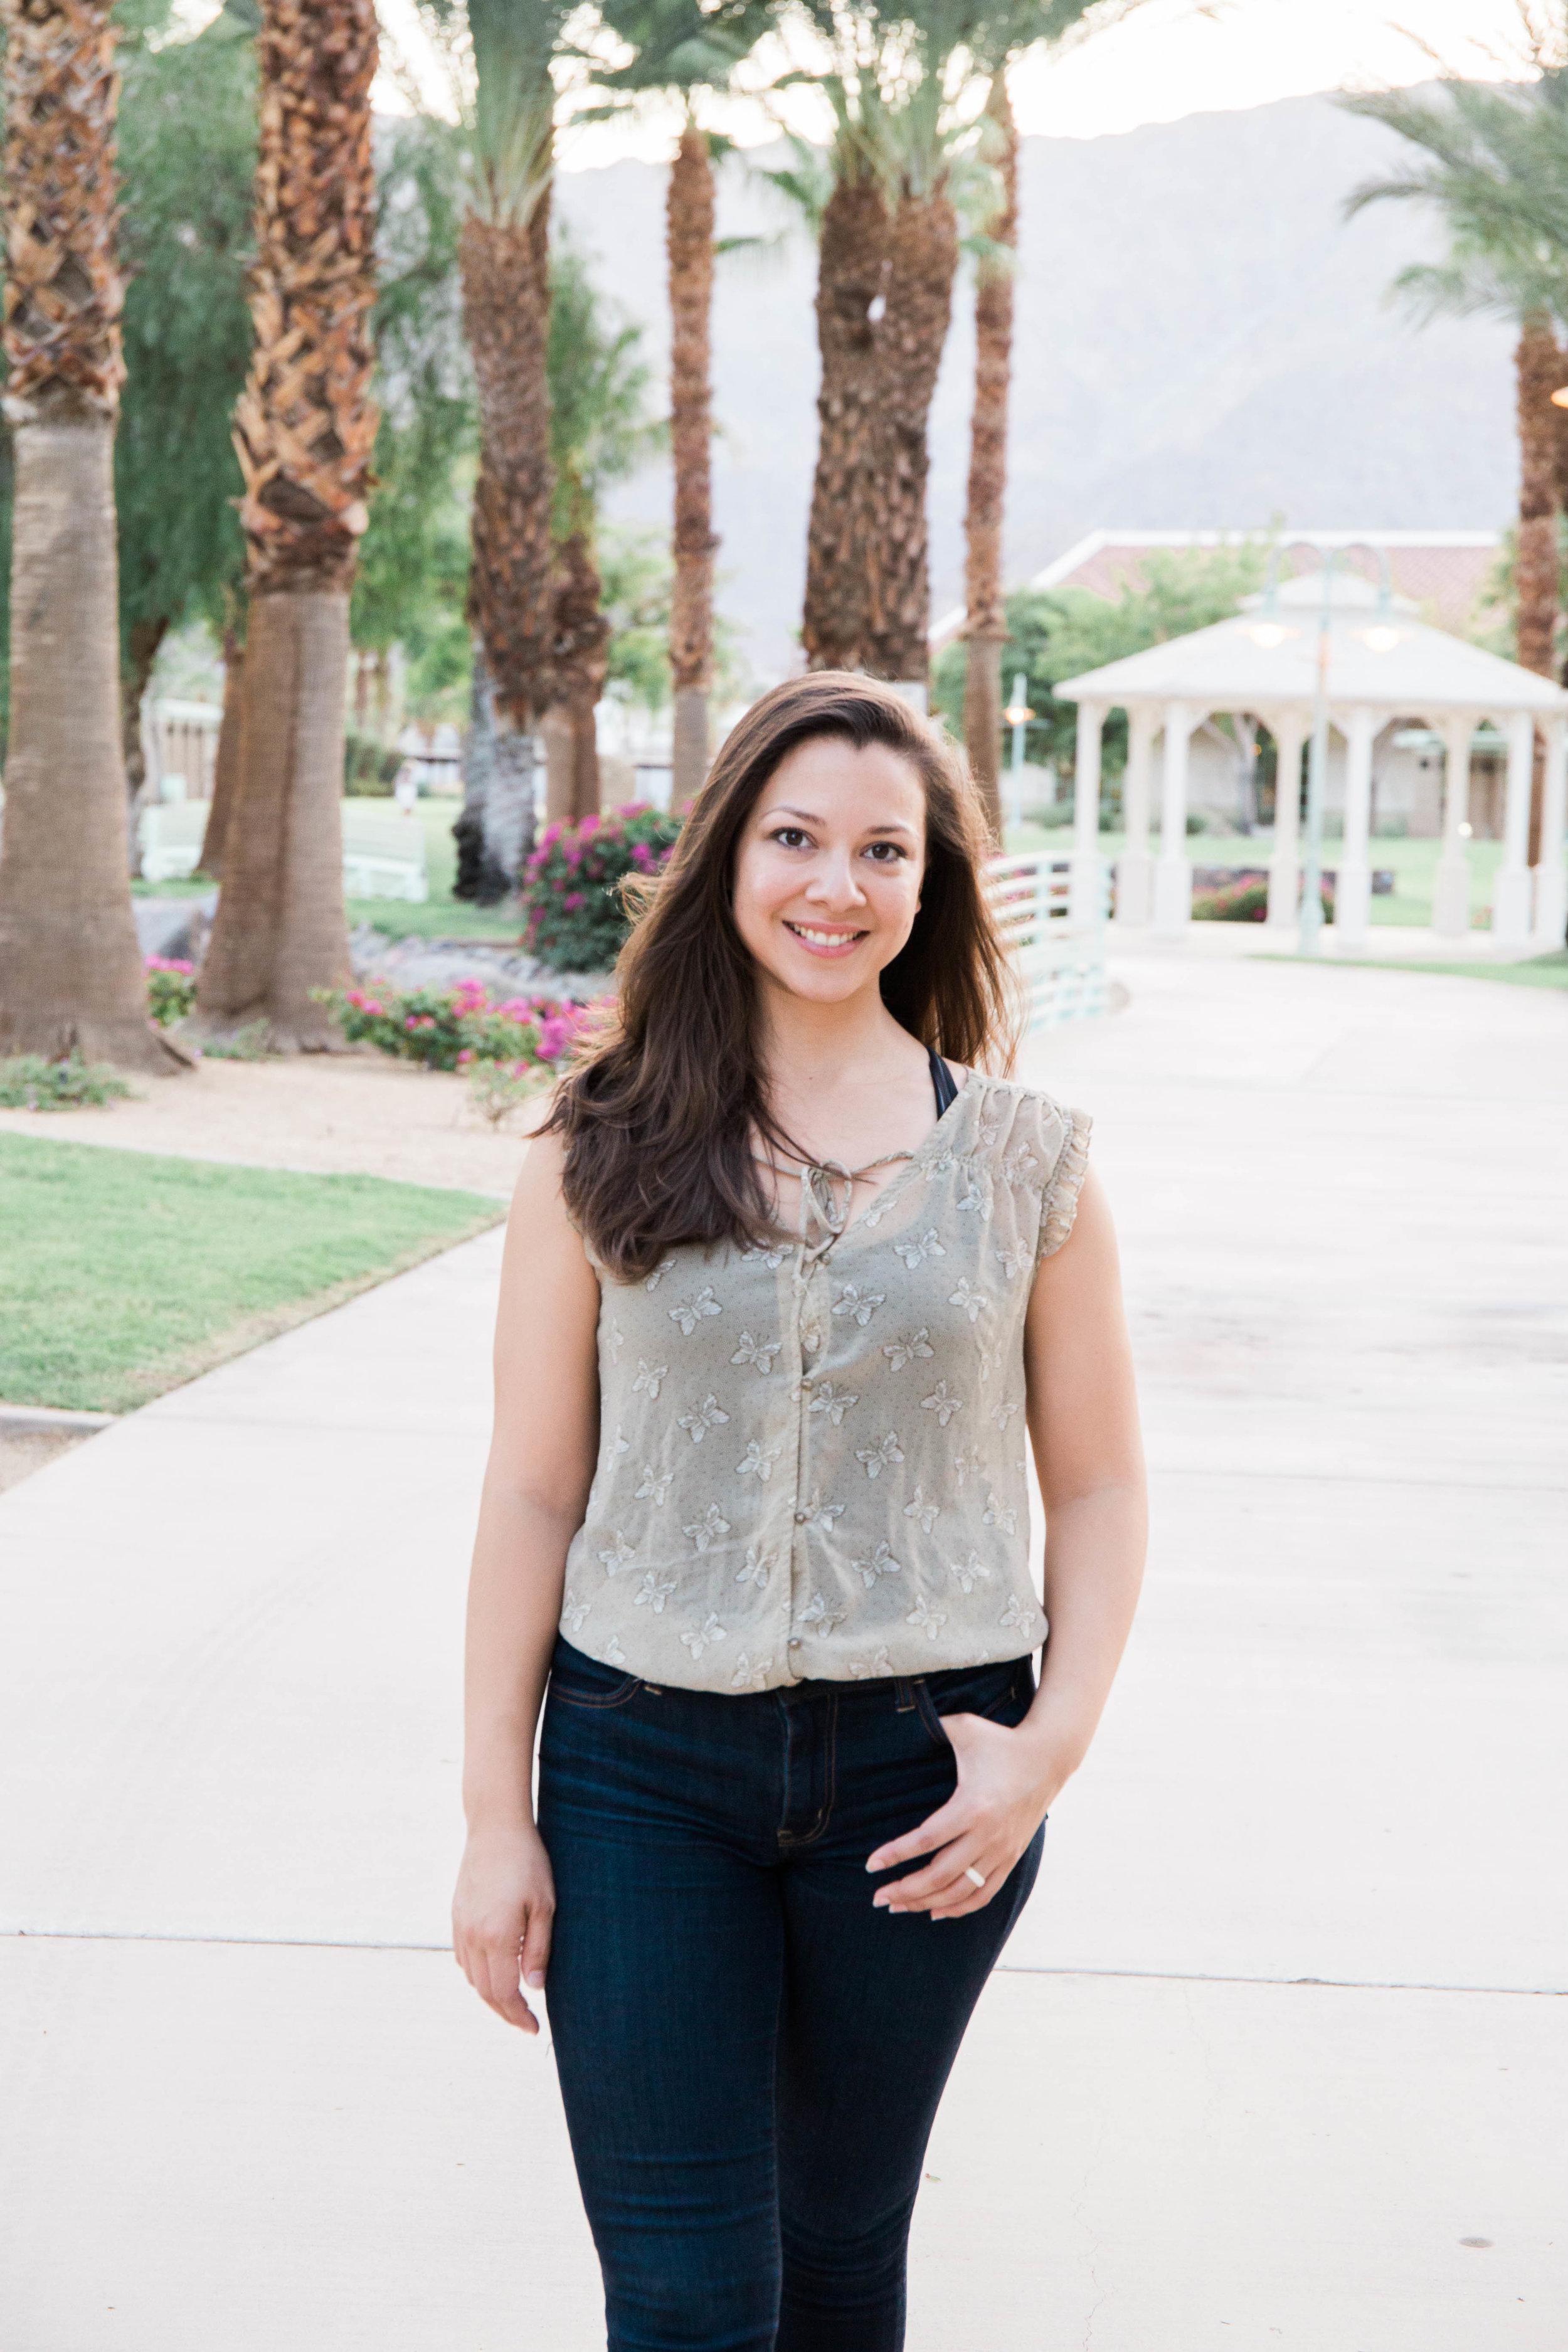 Olivia Avilez + Health//Wellness Holistic Coach & Yoga Instructor